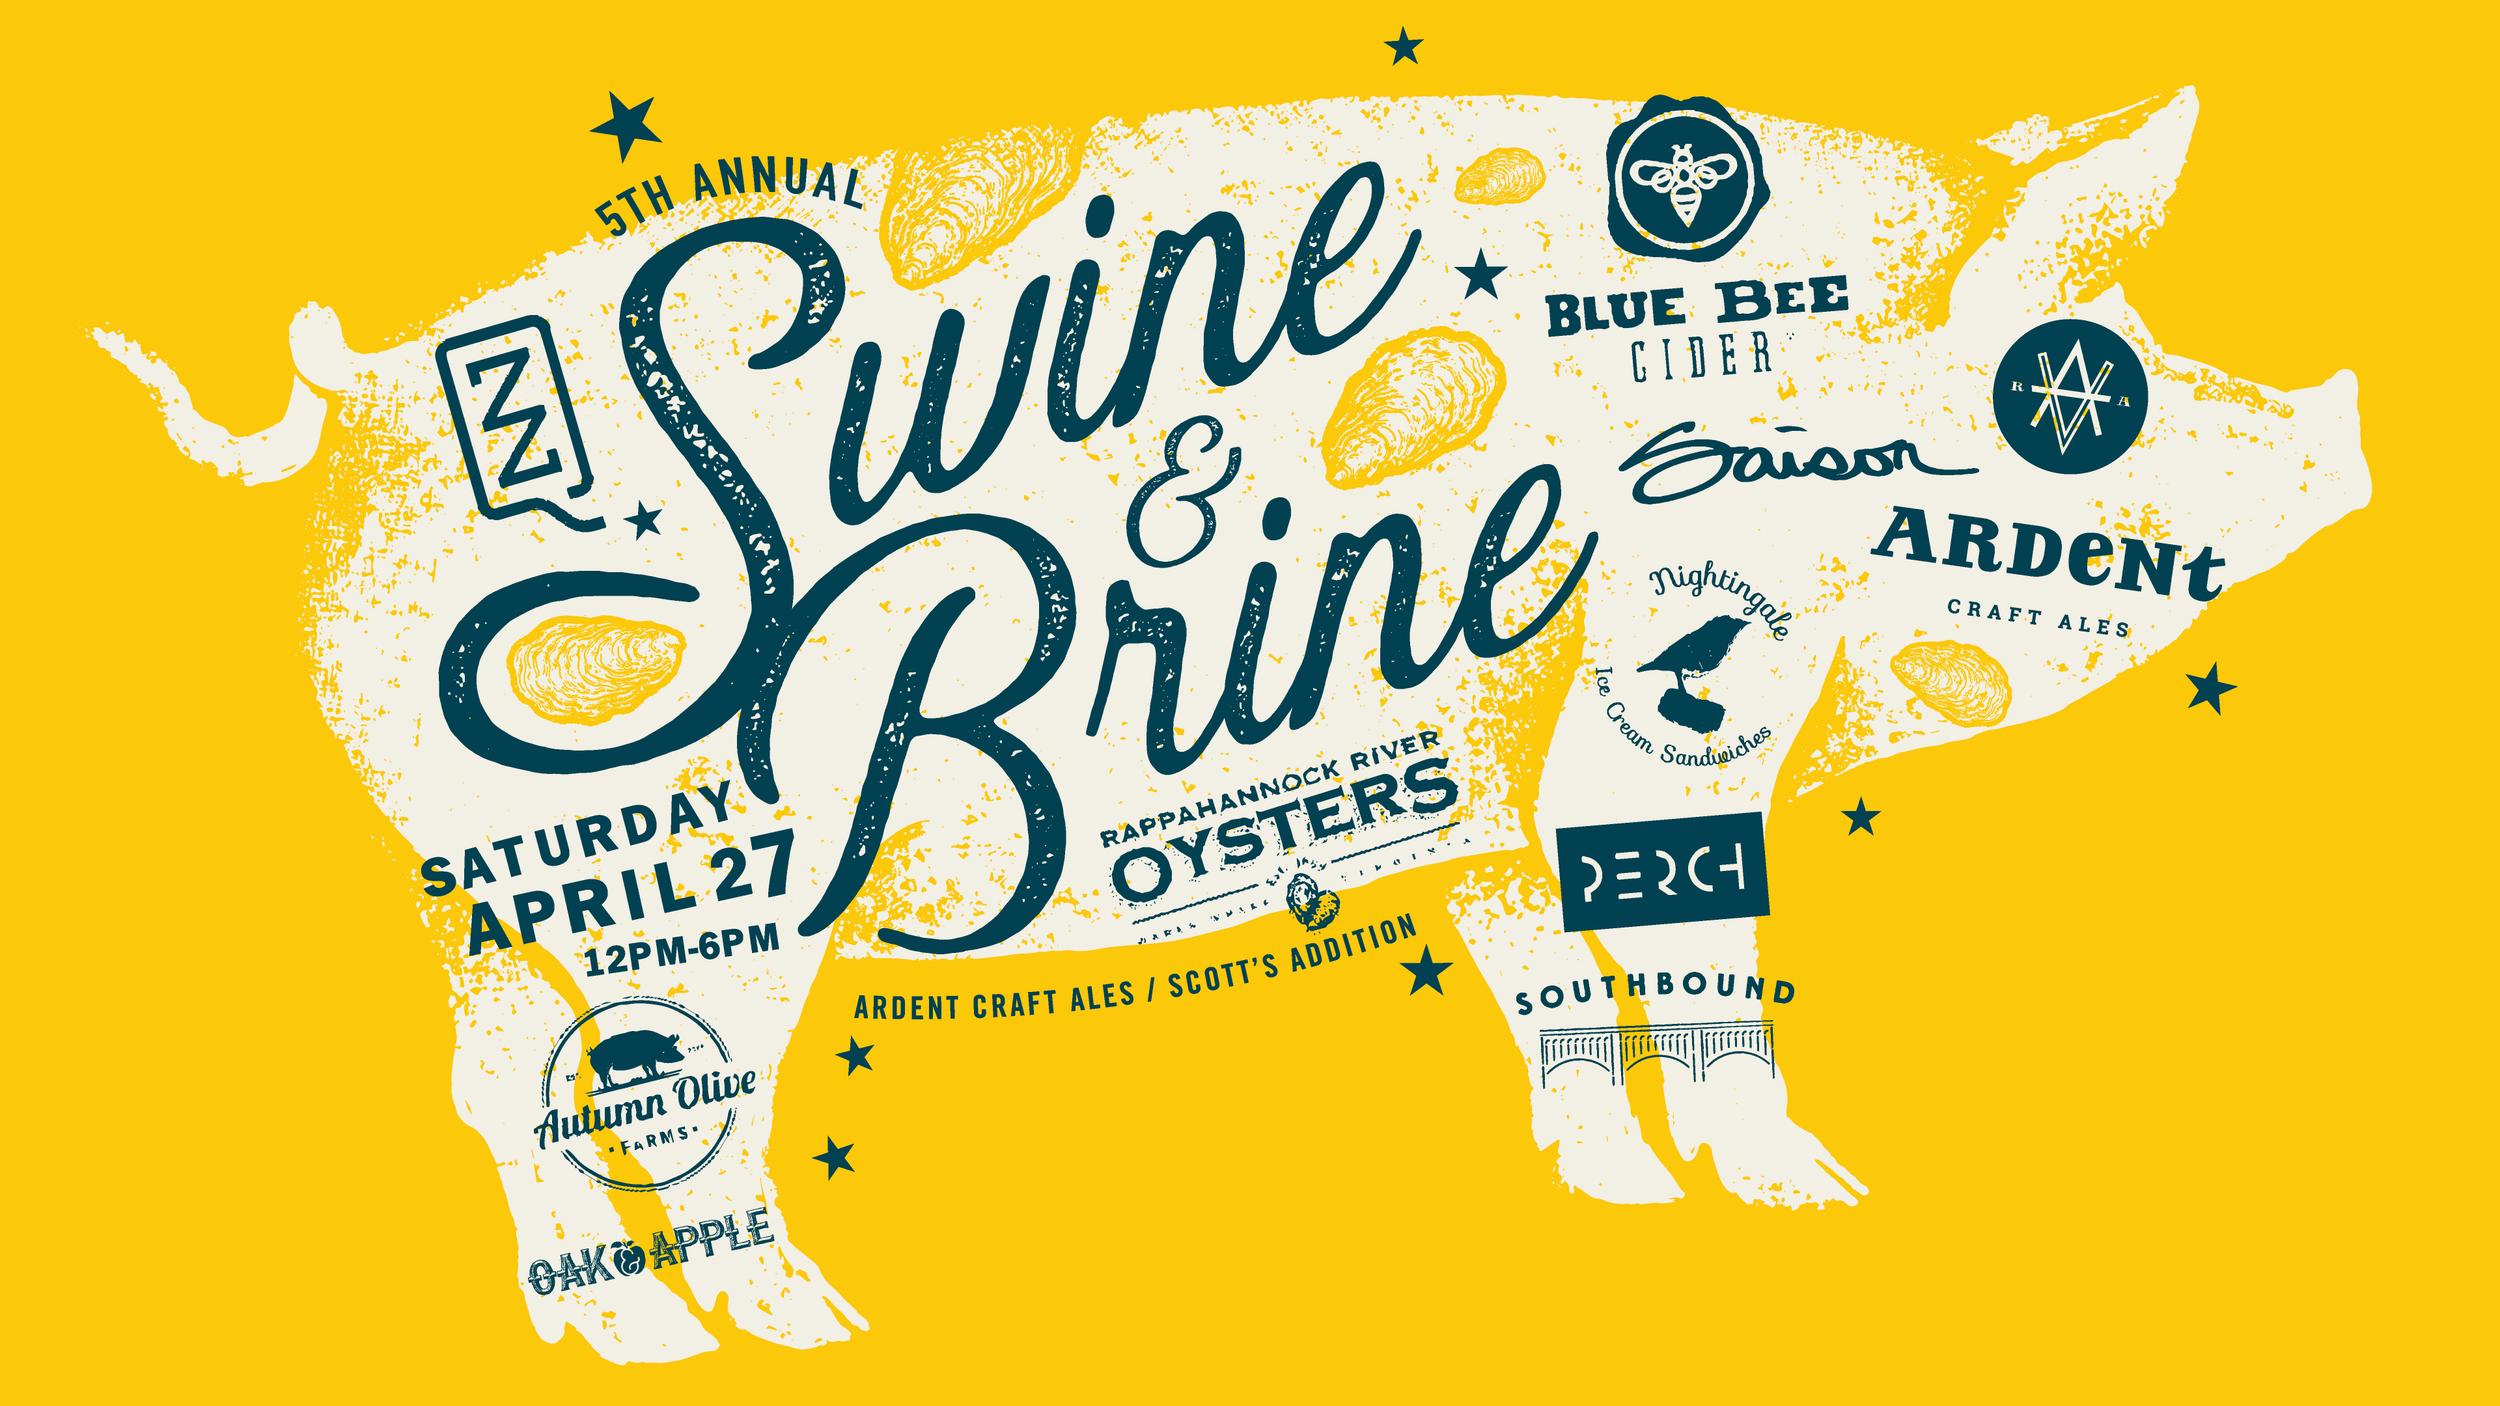 SWINE-fb-event.png